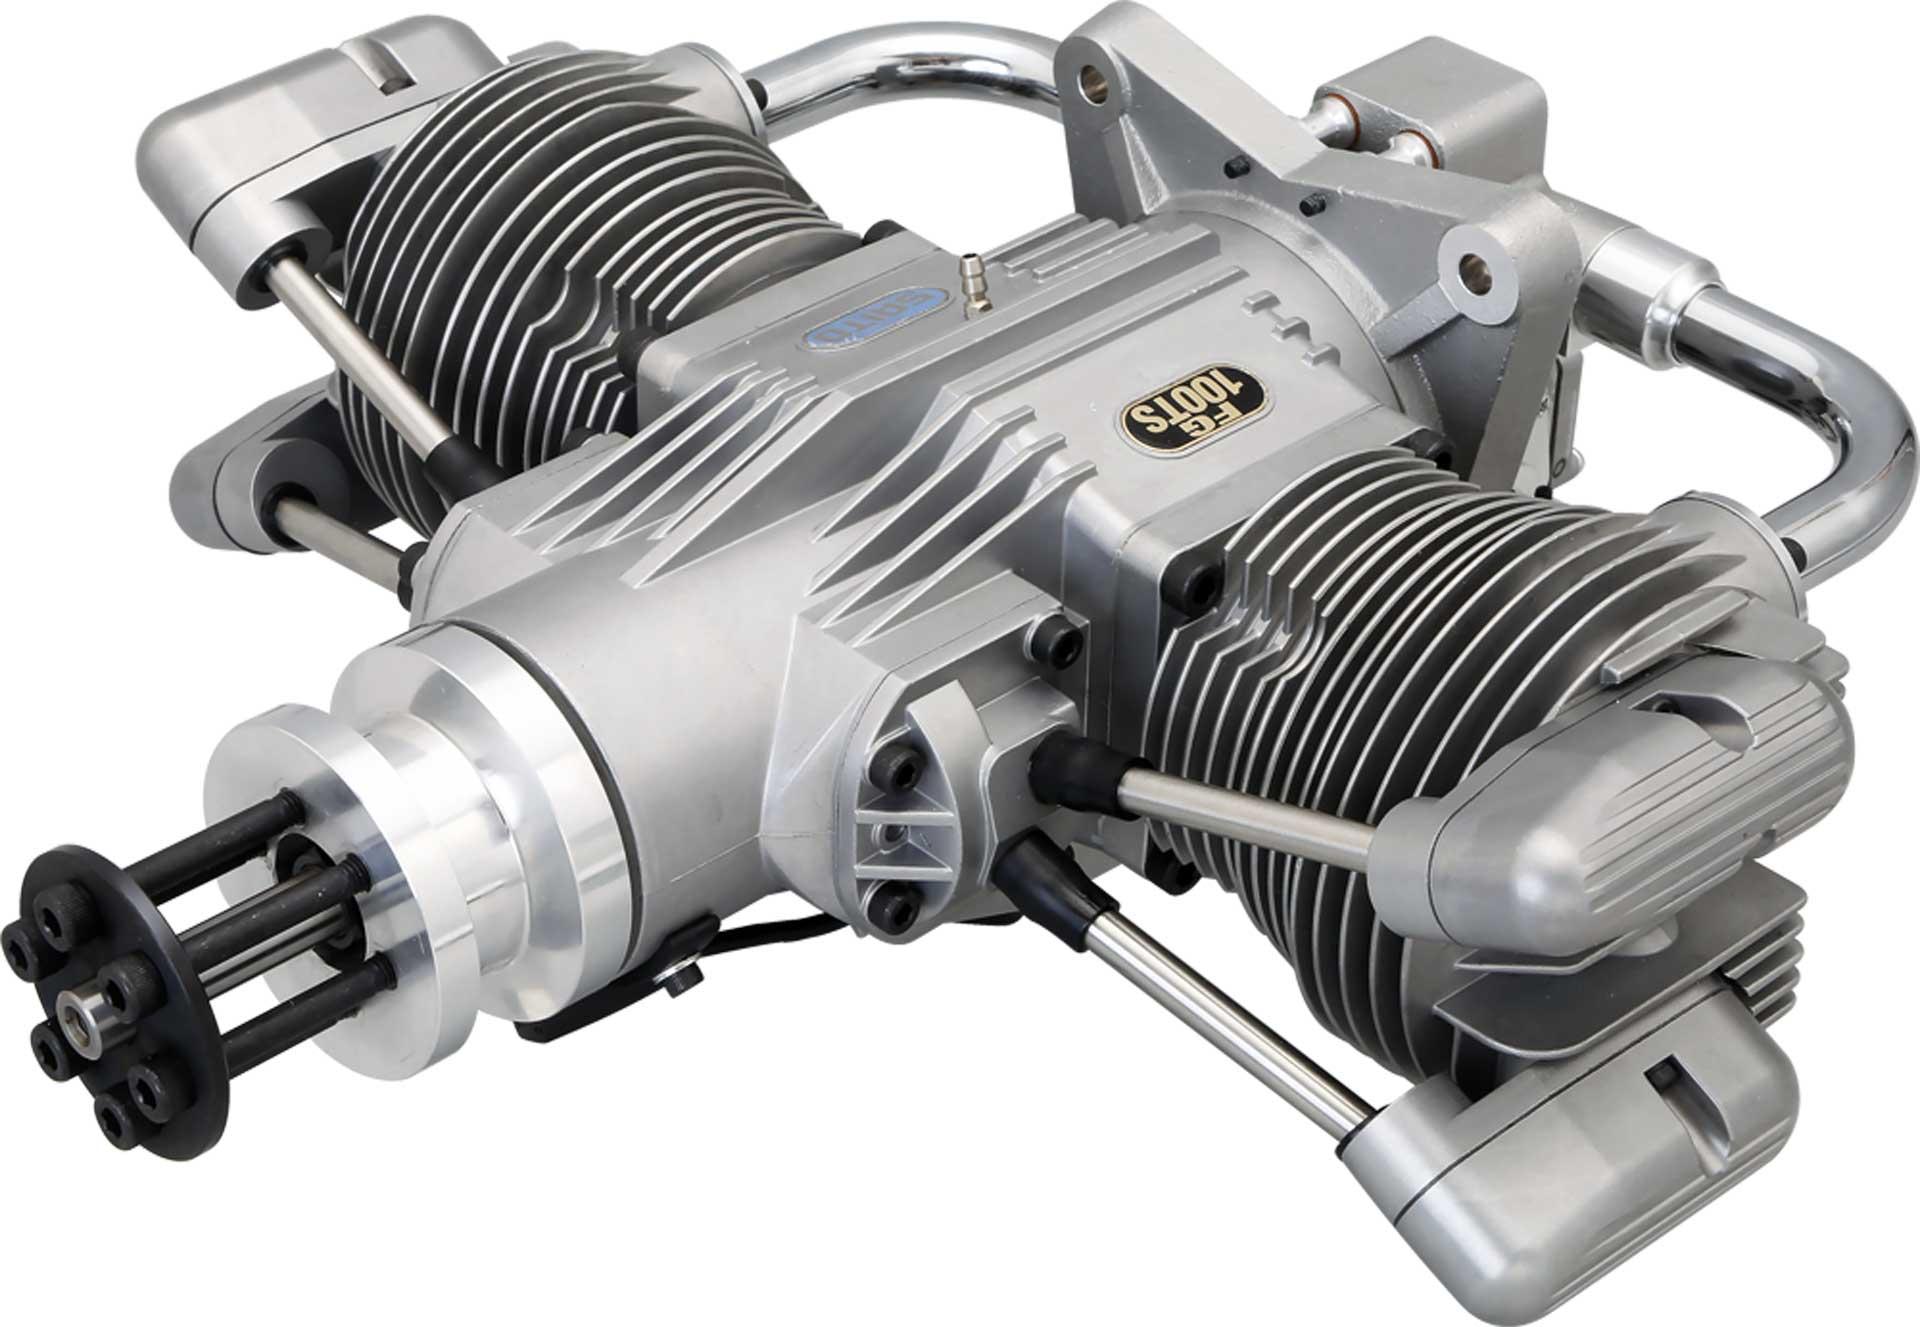 SAITO FG-100TS BOXER BENZIN MOTOR 2-ZYLINDER